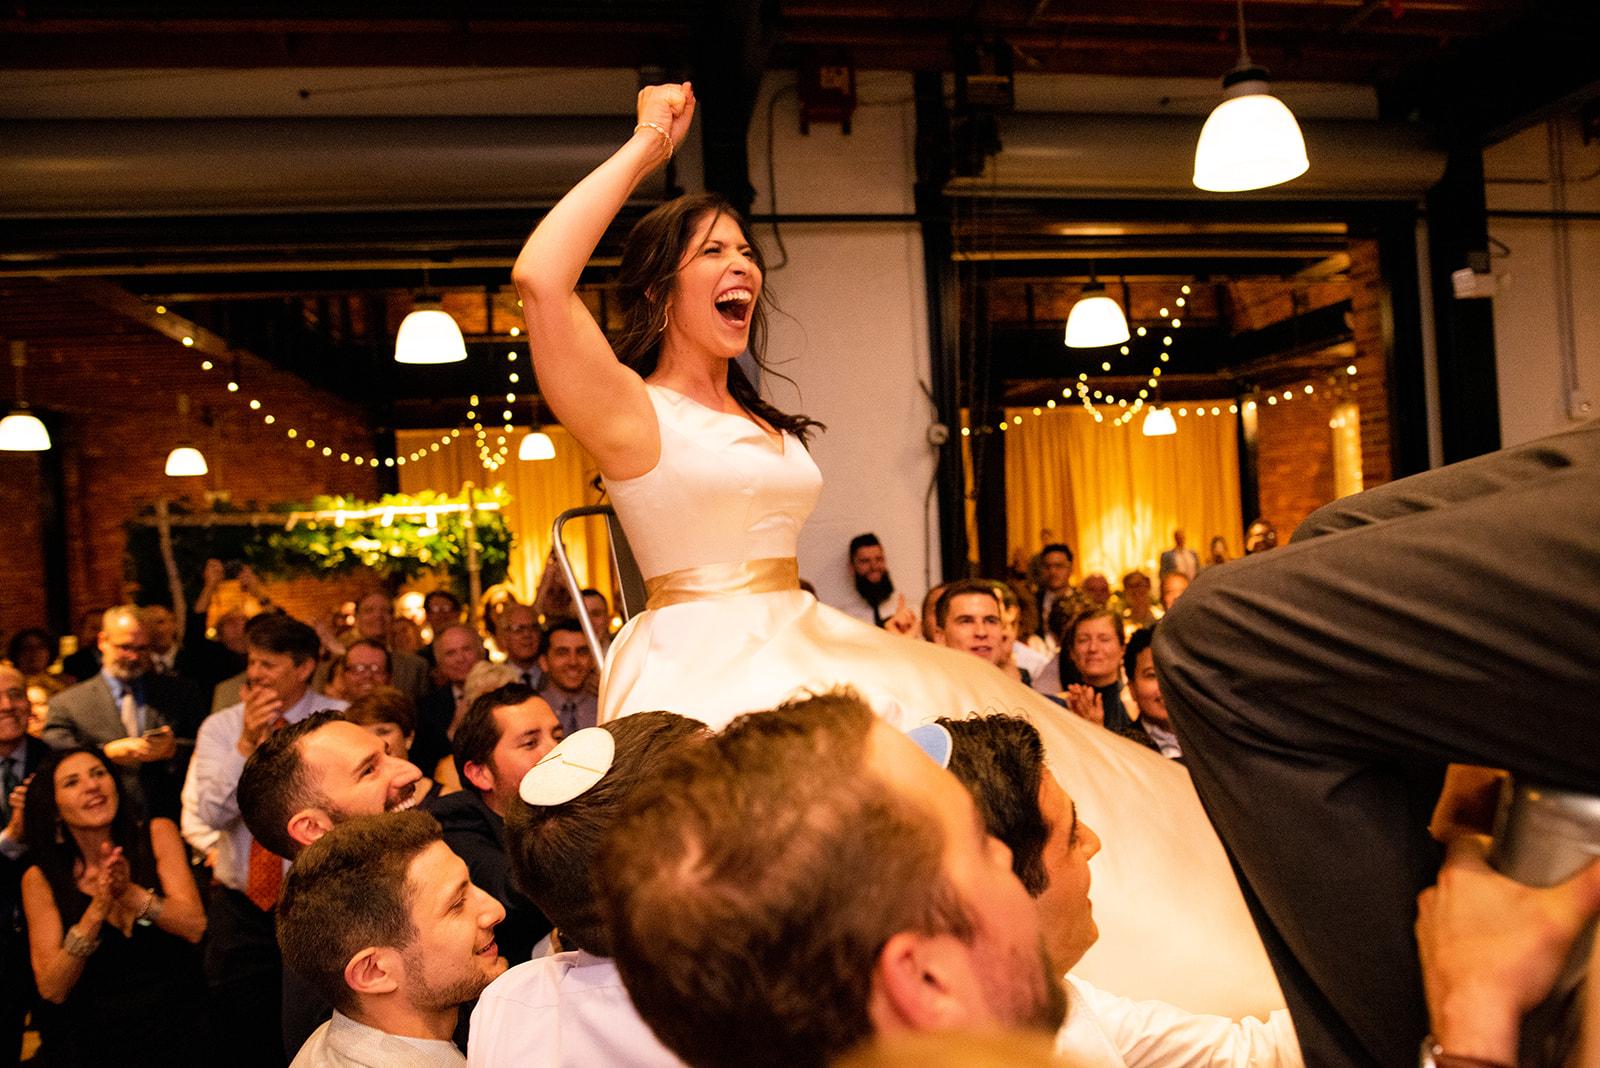 The_best_of_the_best_wedding_photographer_Mantas_Kubilinskas-799.jpg